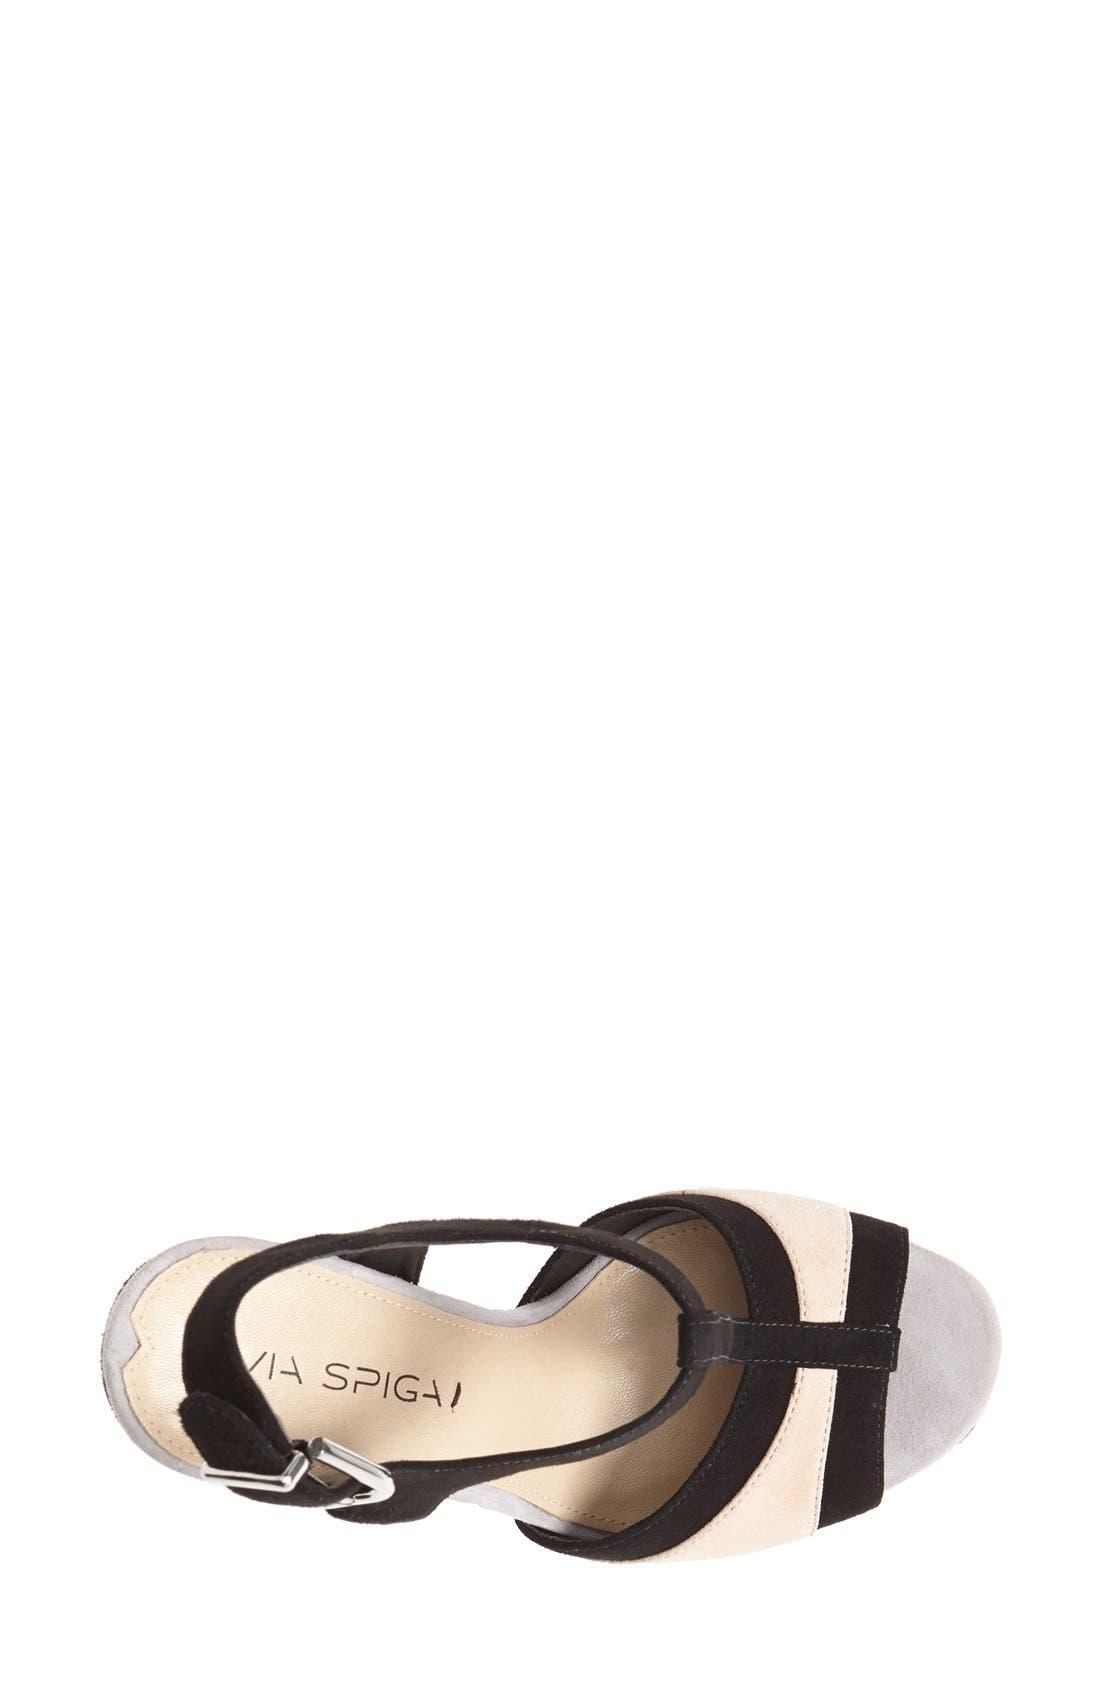 Alternate Image 3  - Via Spiga 'Talisa' T-Strap Sandal (Women)